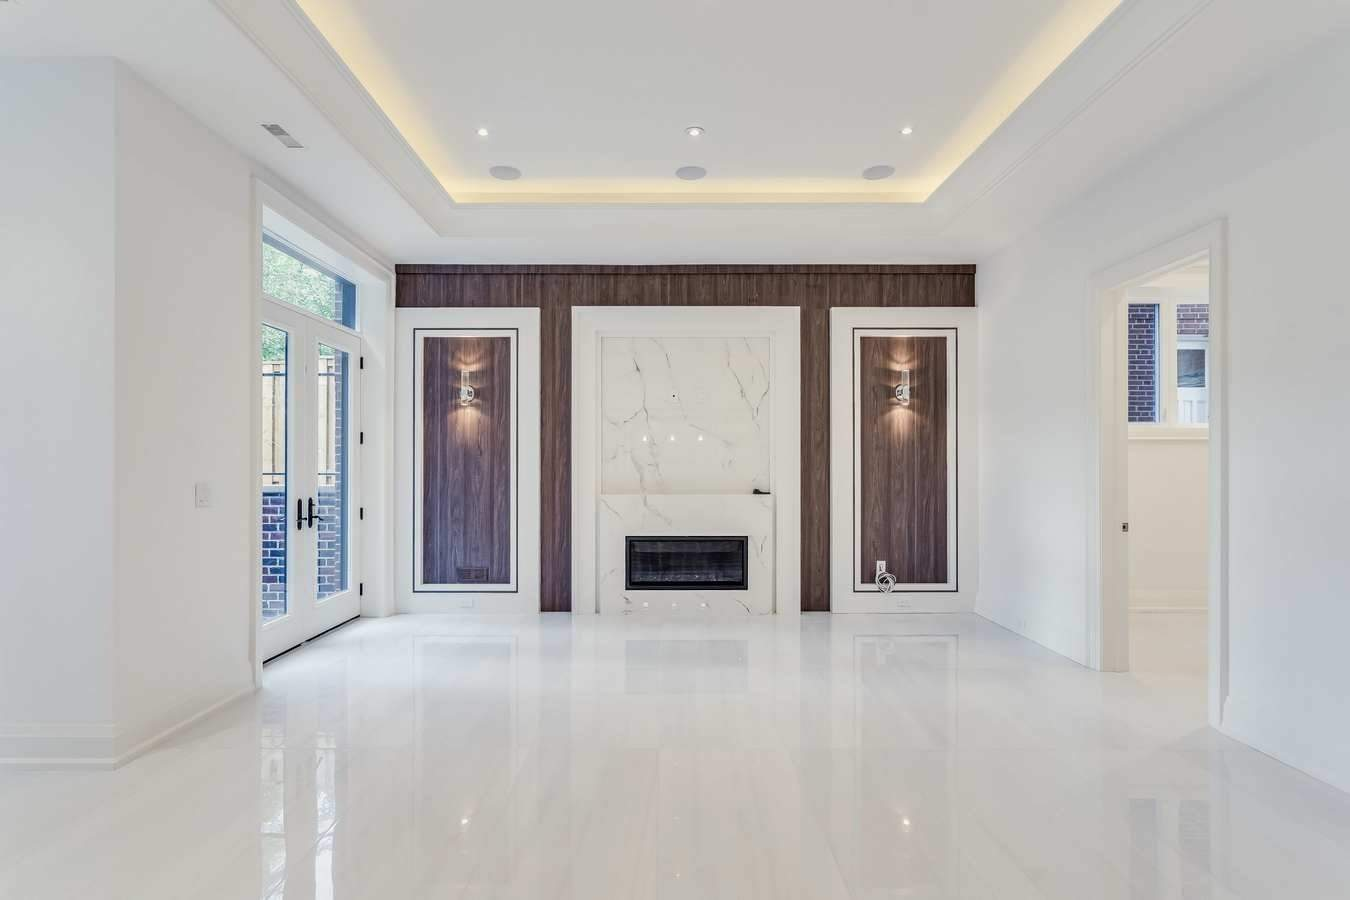 22 Stormont Ave, Toronto, Ontario M5N2B8, 5 Bedrooms Bedrooms, 11 Rooms Rooms,8 BathroomsBathrooms,Detached,For Sale,Stormont,C5096166